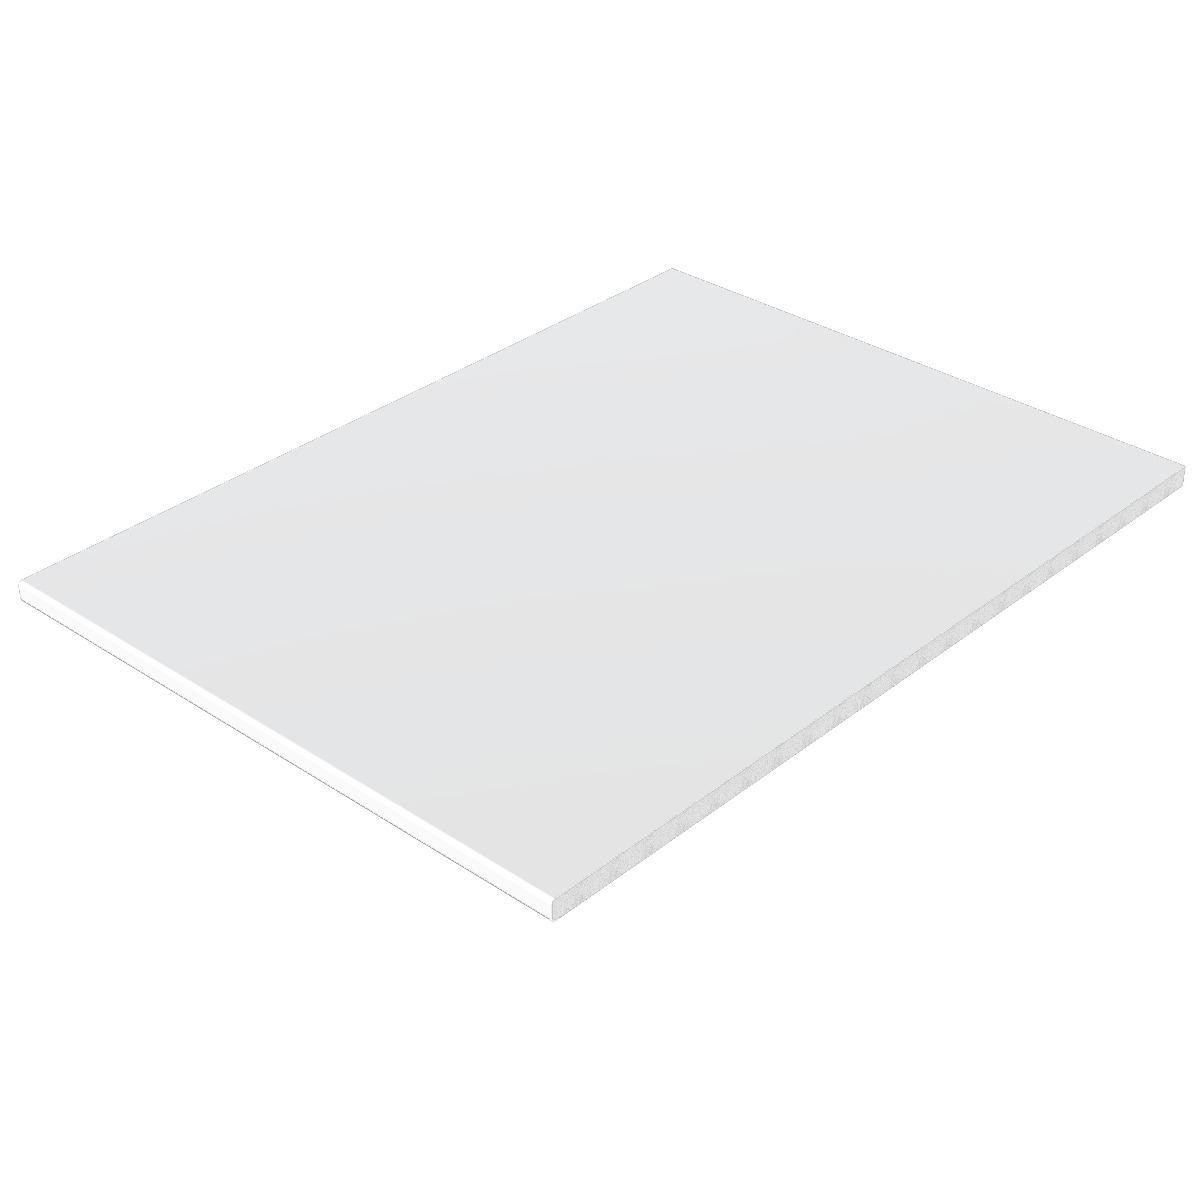 White Foil Flat Board